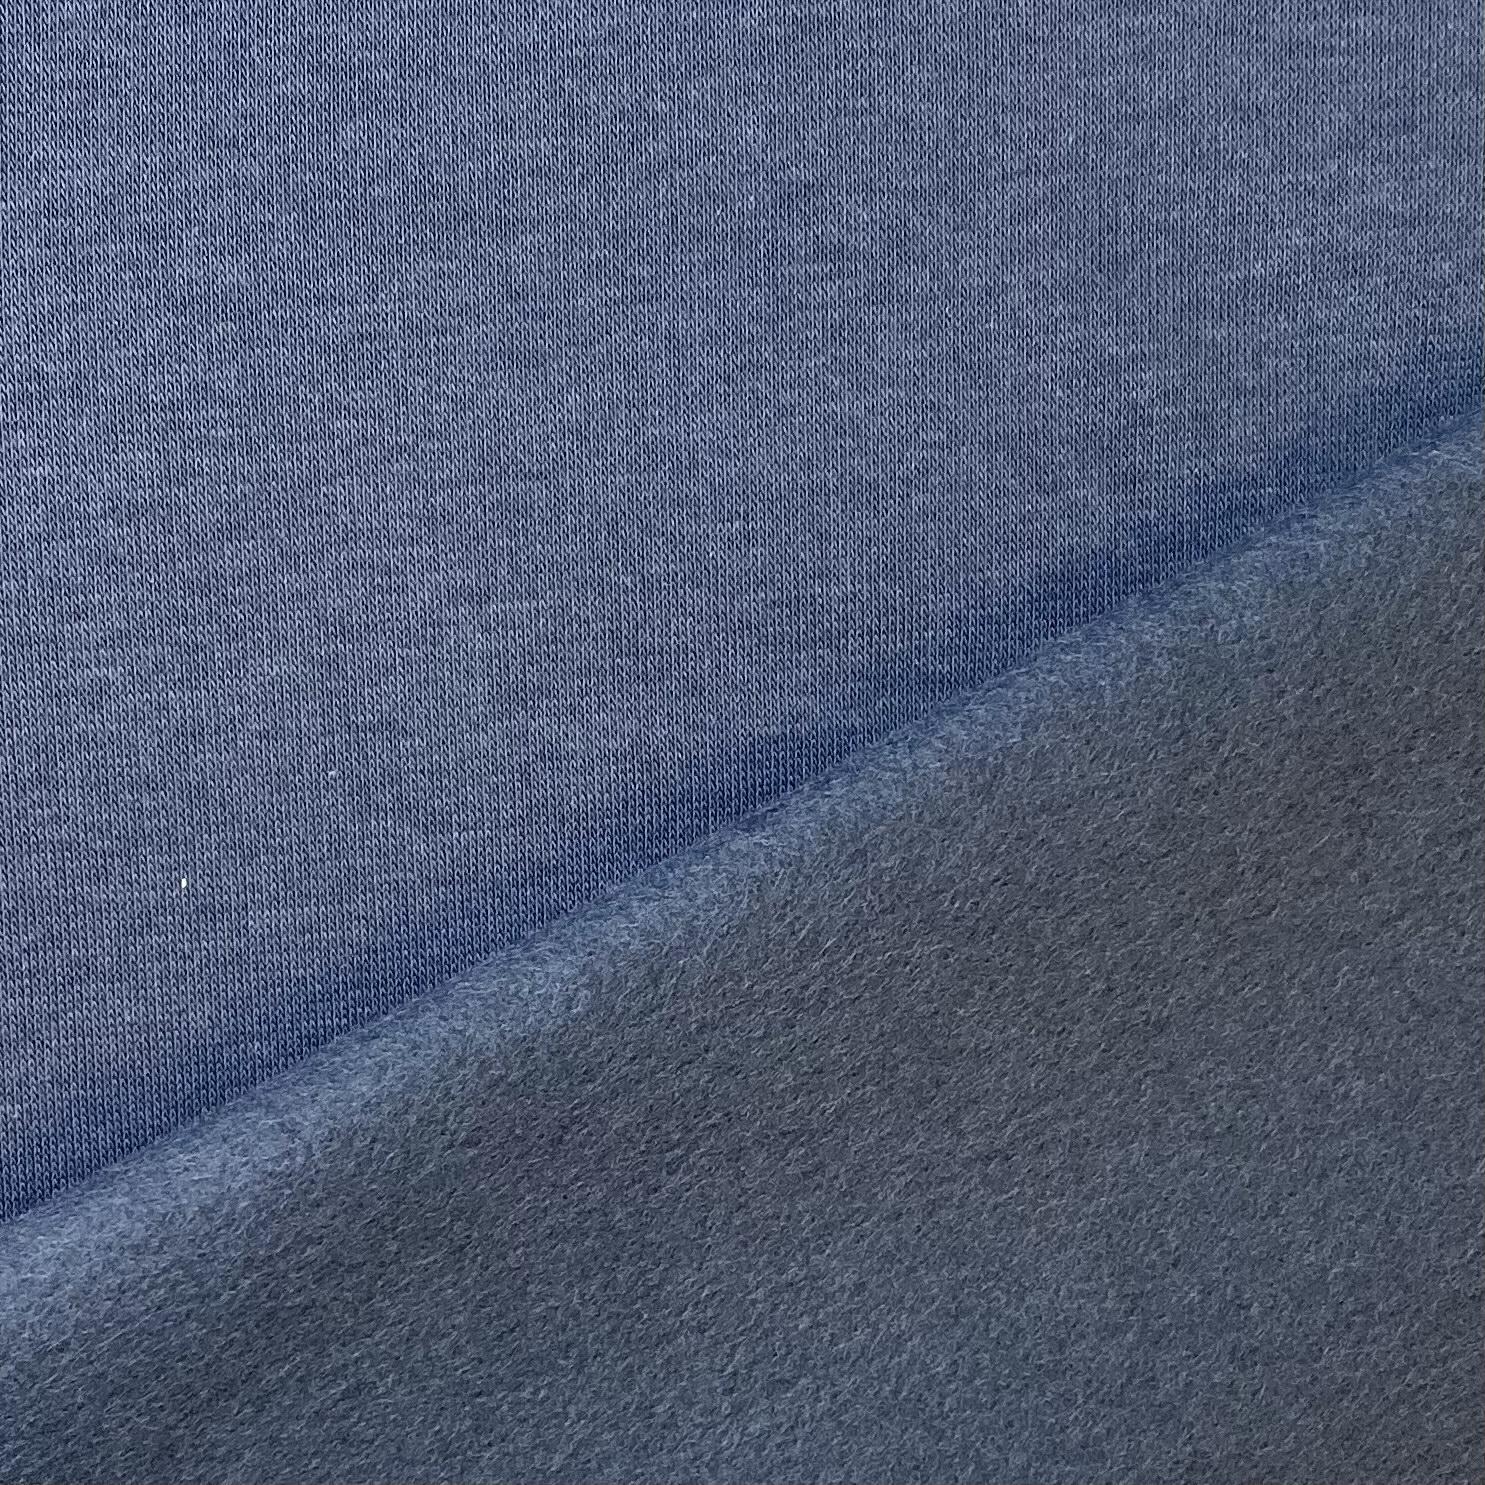 Soft French Terry/Sweatstoff angeraut, dunkelblau, uni. Art. SW10724